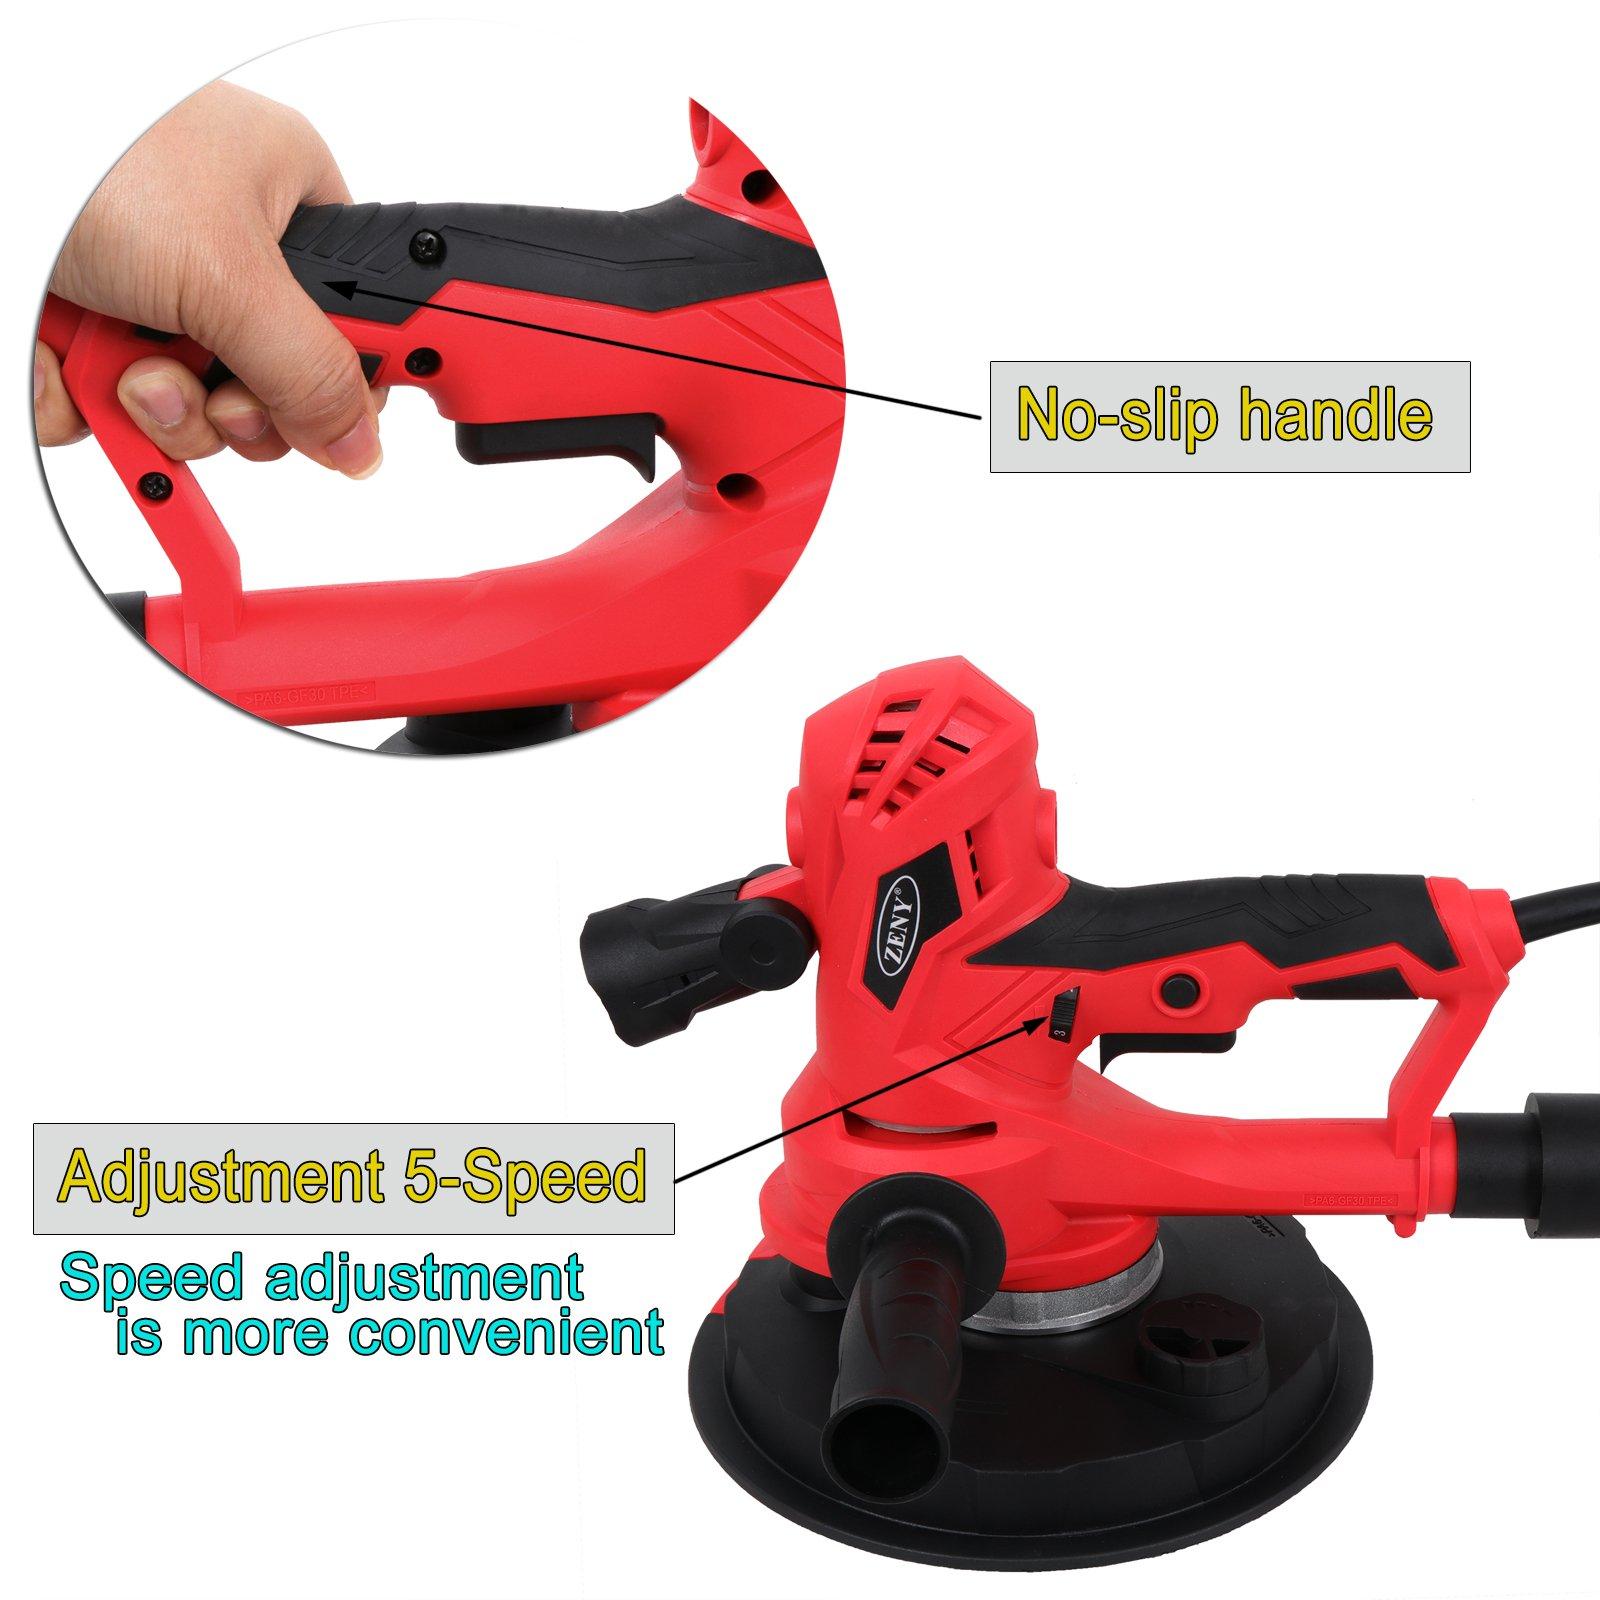 ZENY Electric Handheld Drywall Disc Sander 750W Adjustable Variable Speeds Vacuum Sander w/Sanding Pads & LED Light by ZENY (Image #5)